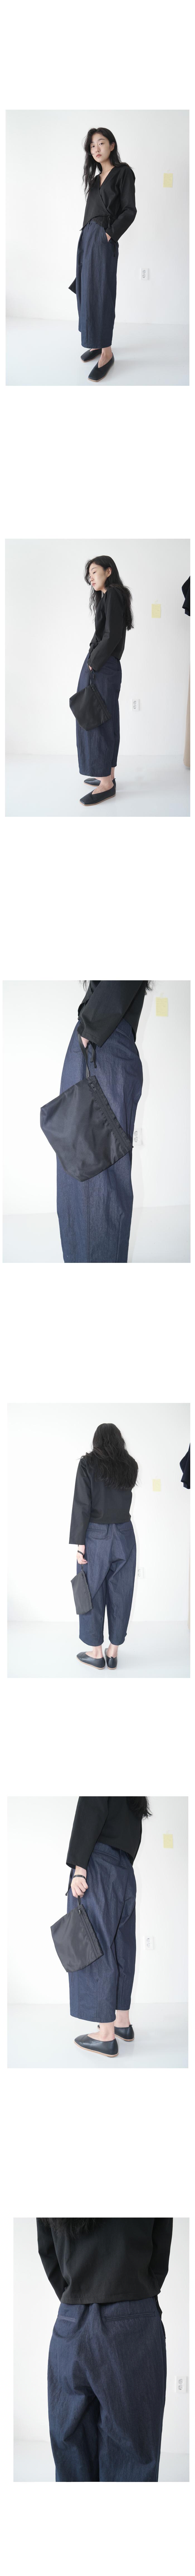 tidy washing cotton set - pants